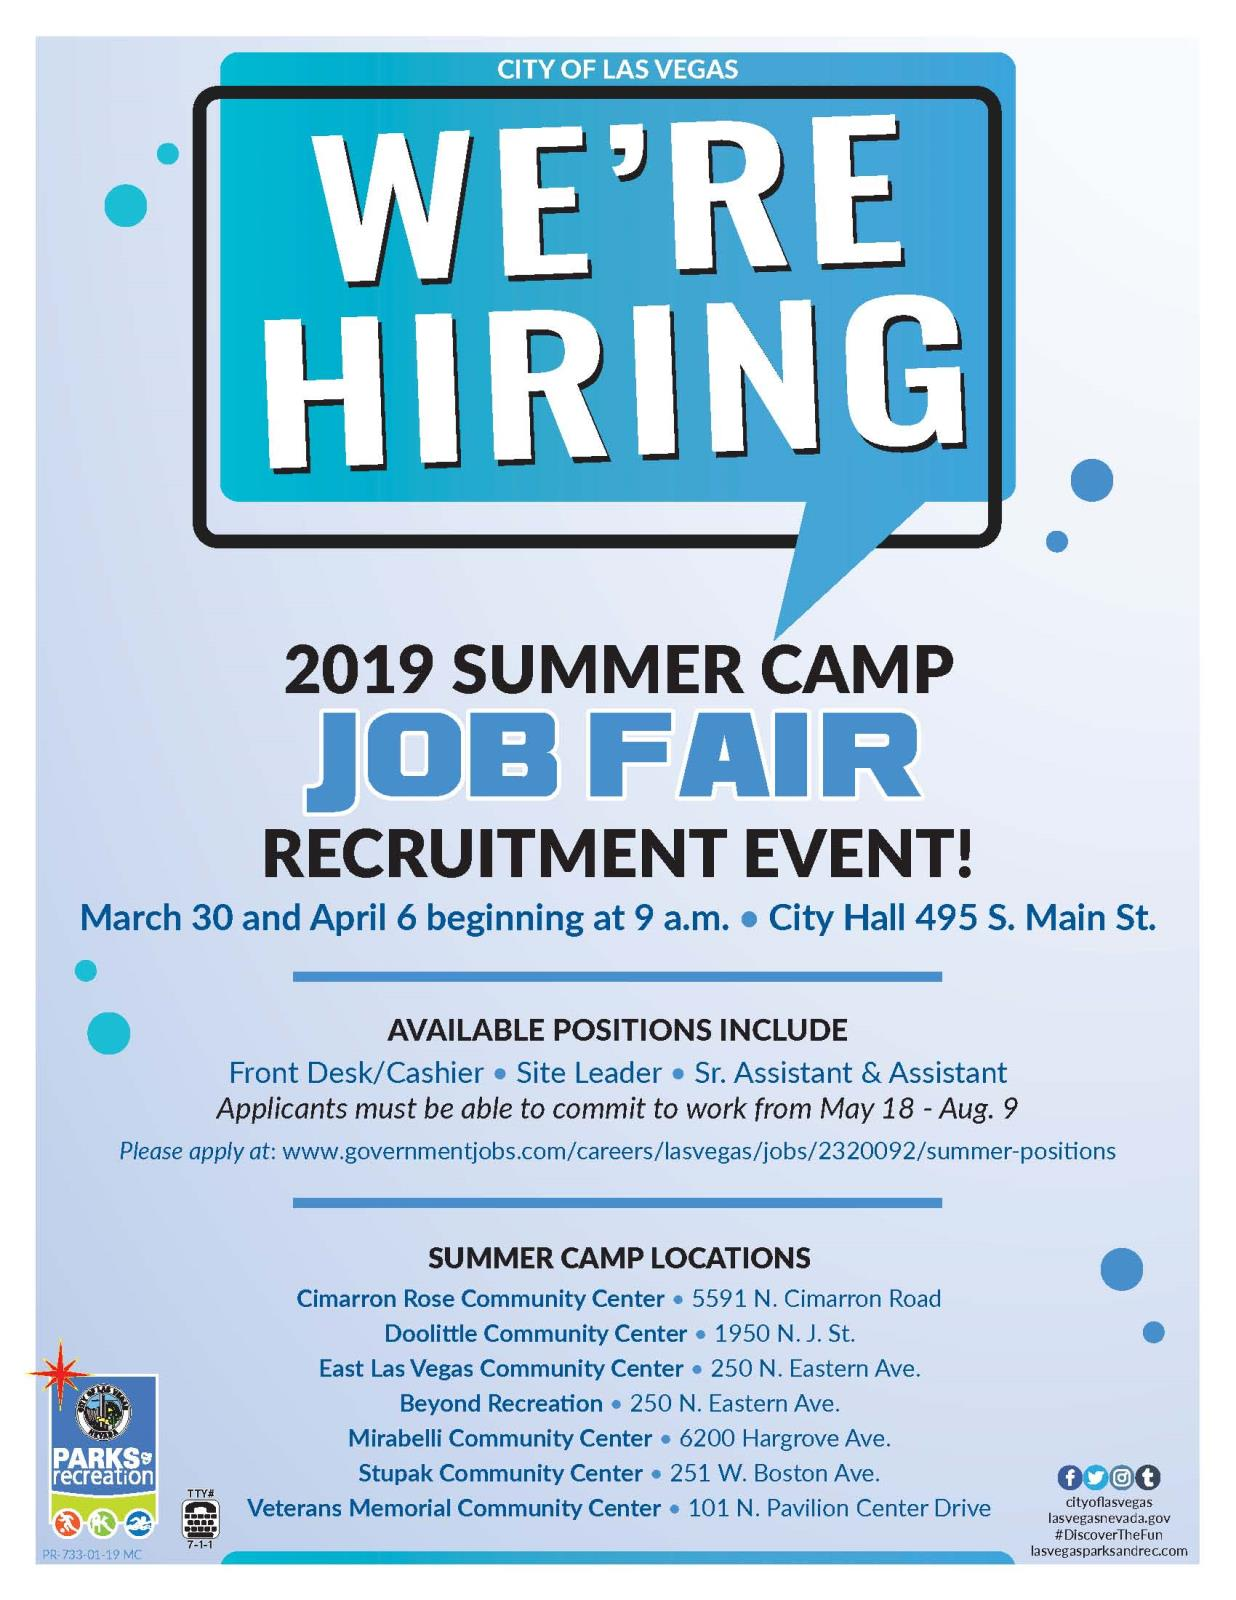 Summer Camp Job Fair 2019 flier-1.jpg